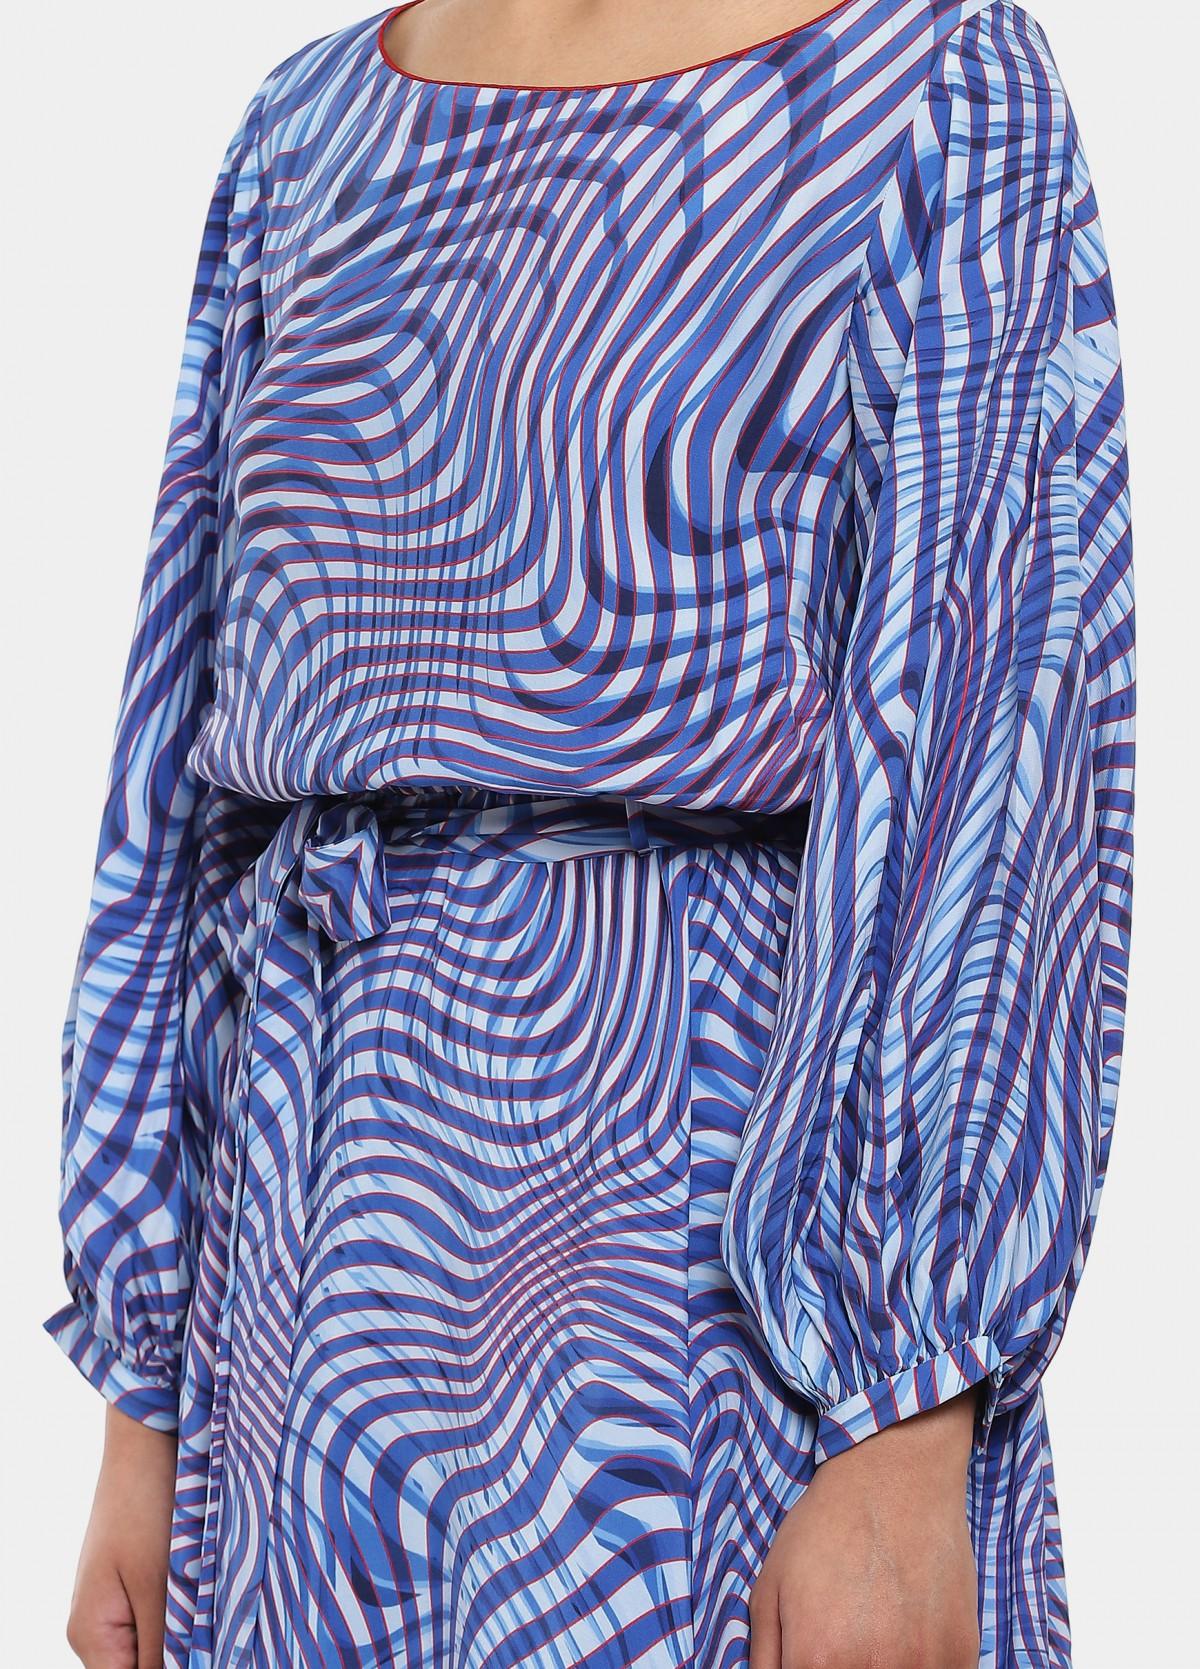 The Moody Blues Dress